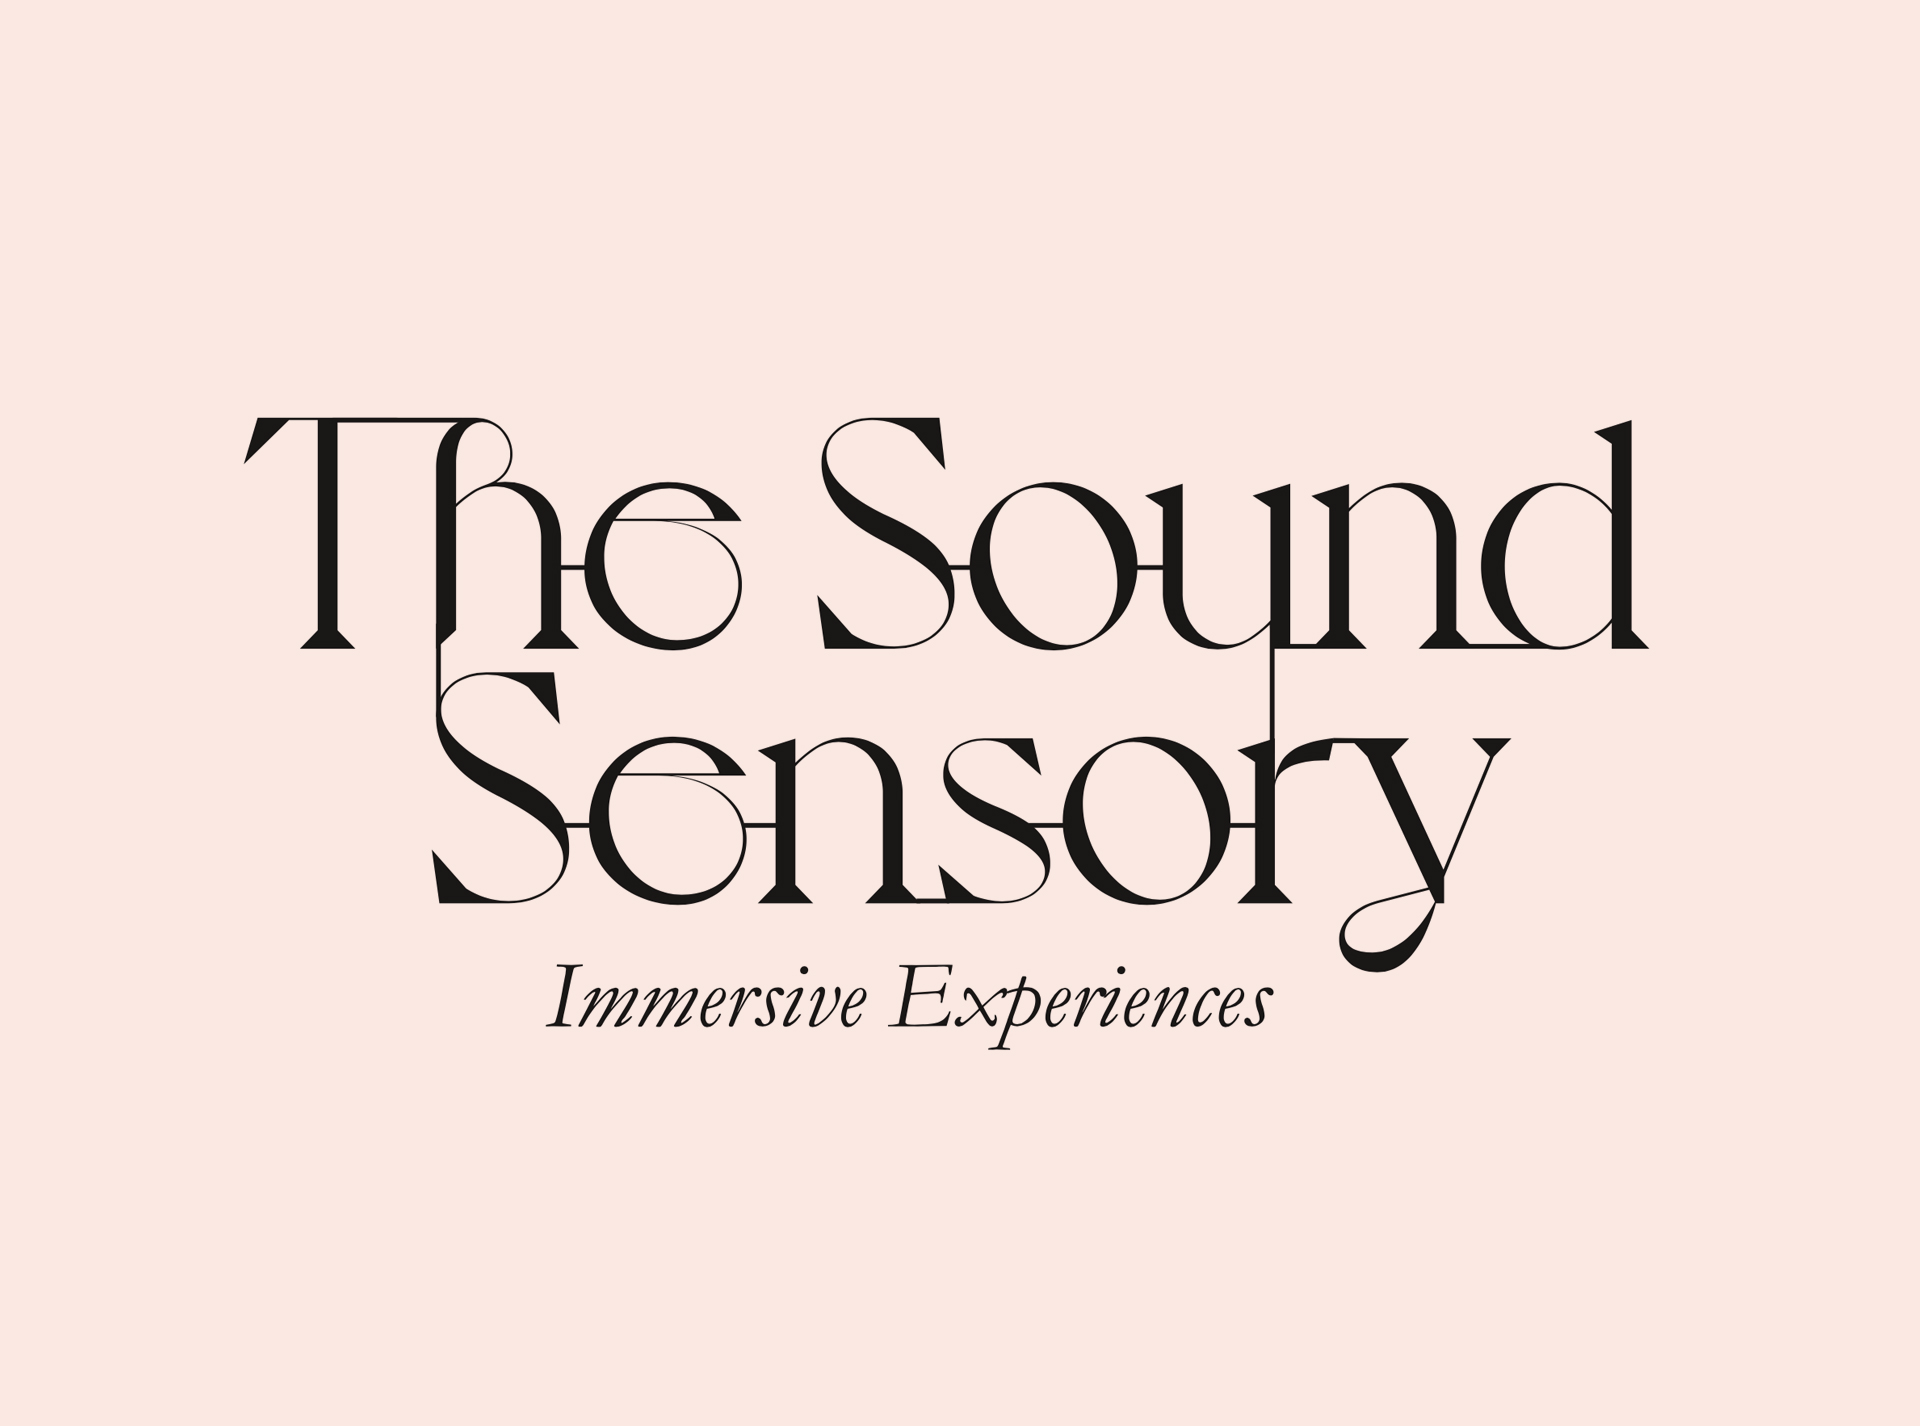 The-Sound-Sensory-Website-Home-LOGO DESIGN STUDIO MIMI MOON